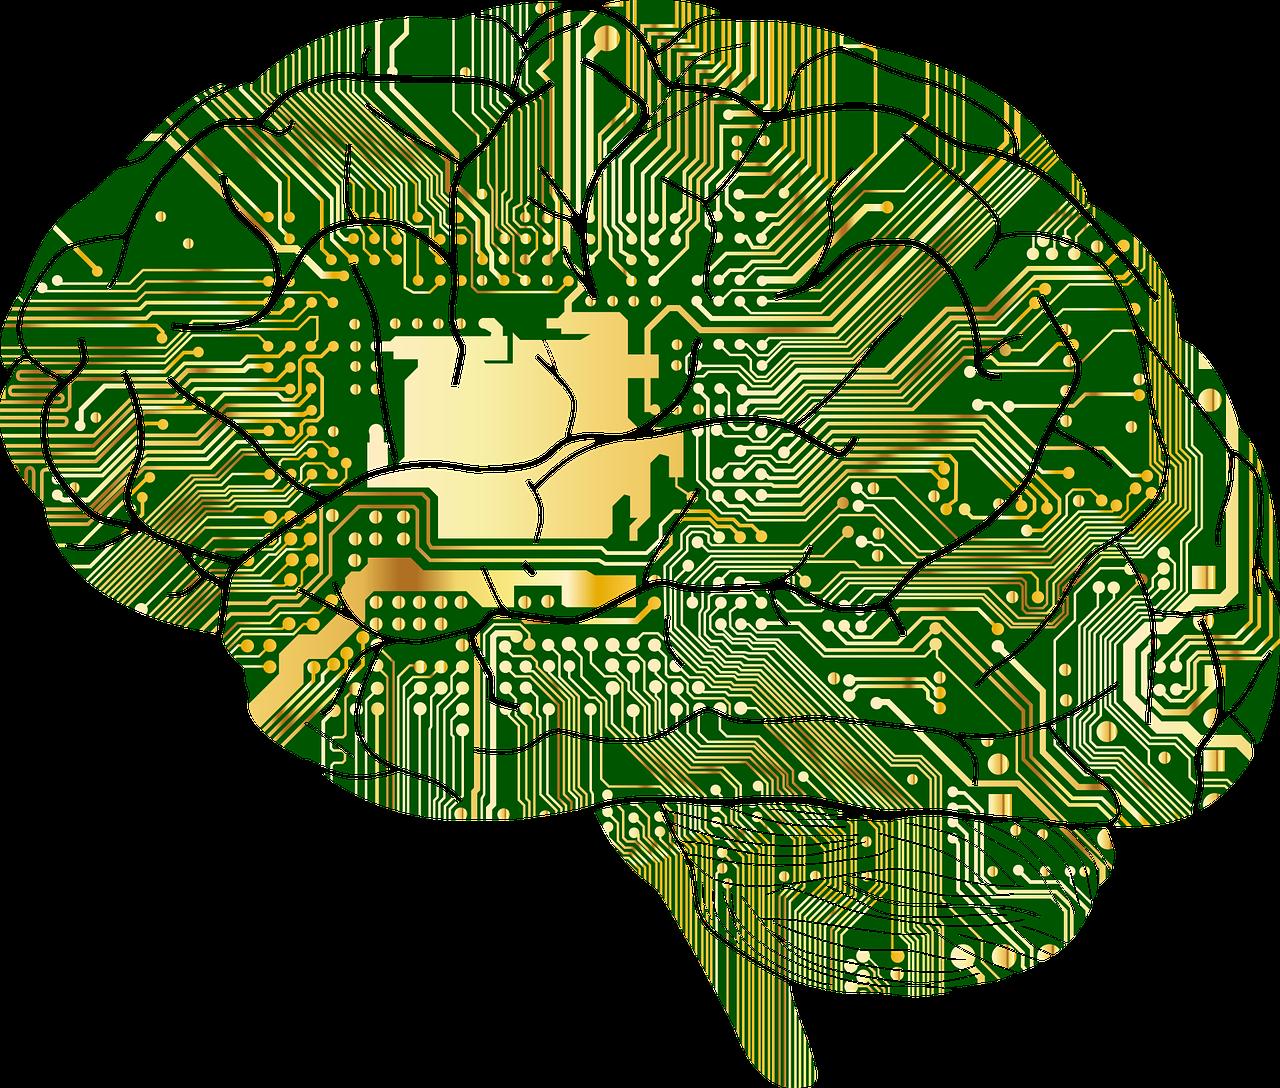 SONYとソニーネットワークコミュニケーションズが、人工知能(AI)を実現するディープラーニング(深層学習)の統合開発環境Neural Network Consoleを公開